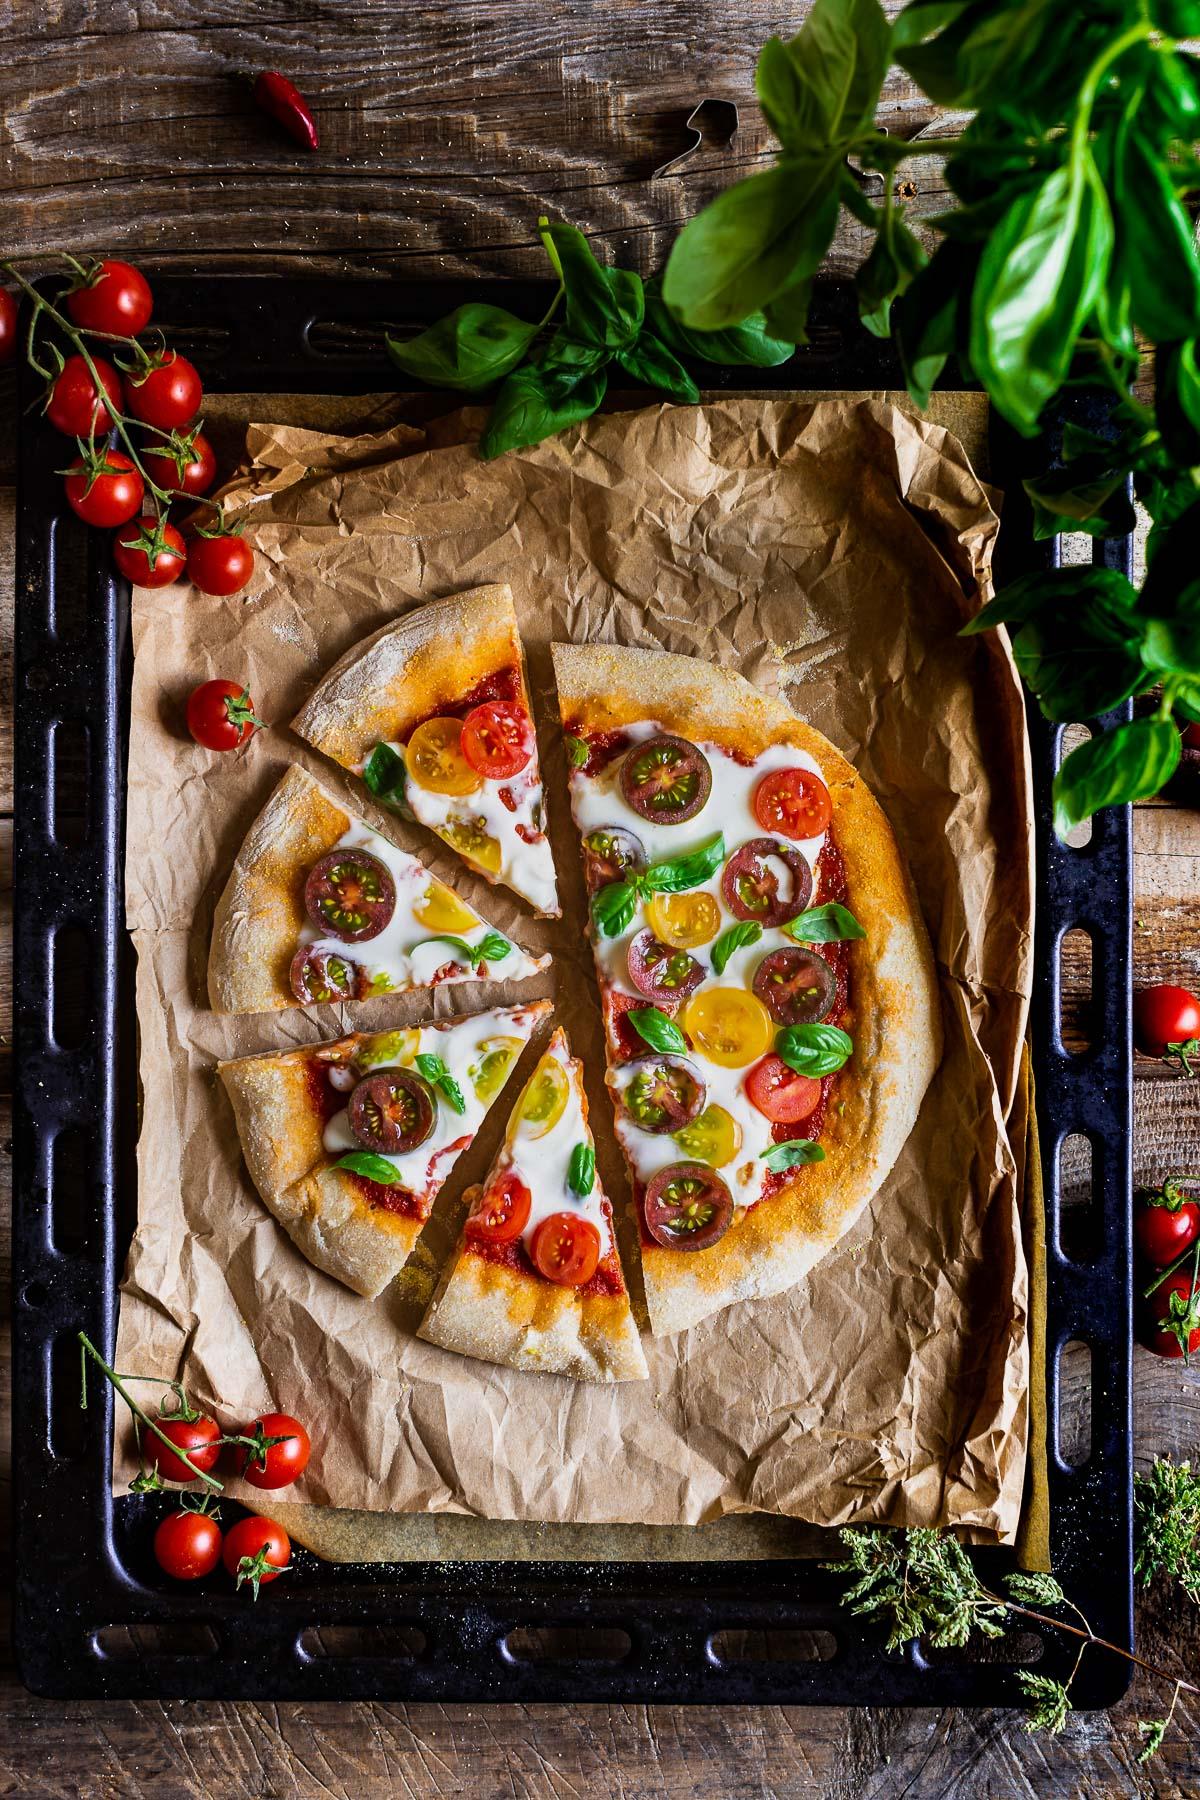 VEGAN SPELT PIZZA with VEGAN MOZZARELLA SAUCE simple easy #vegan PIZZA di FARRO a lunga lievitazione PIZZA VEGAN con SALSA MOZZARELLA VEGAN pomodori basilico rucola